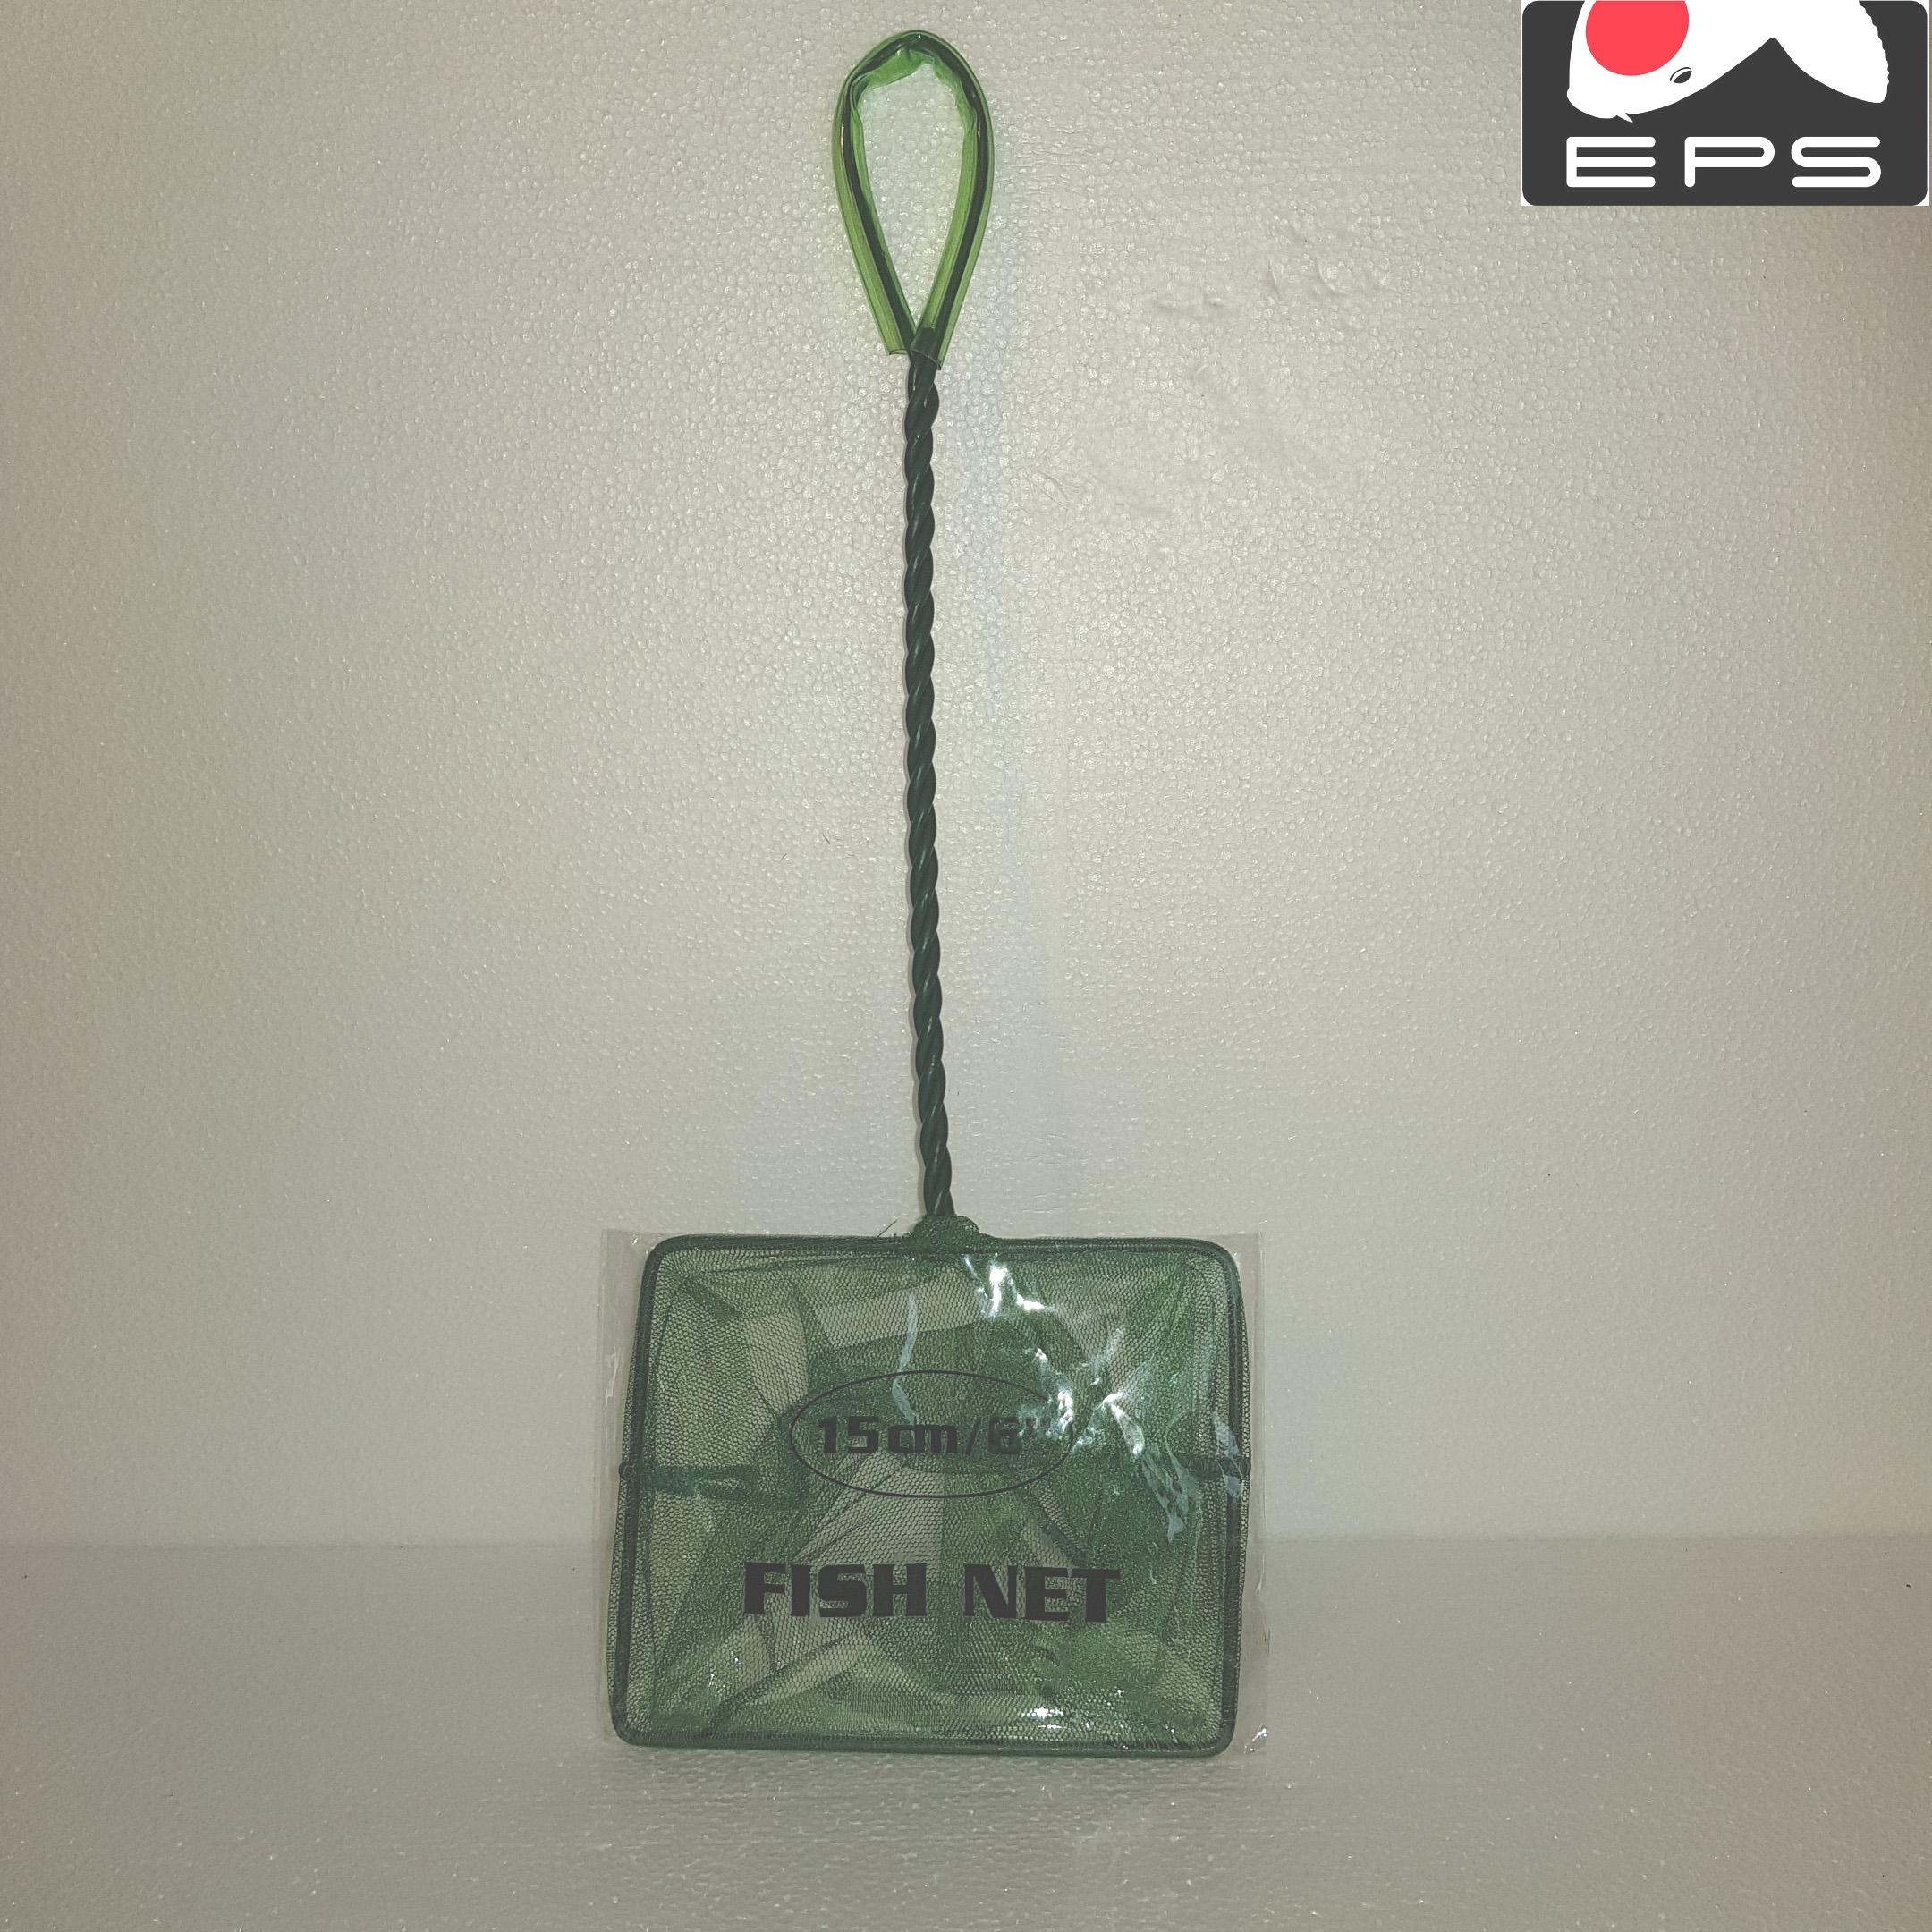 Aquarienkescher, Aquarien-Kescher, Kescher für Aquarien / Aquarium 15 x 12 cm, Griff: 25 cm